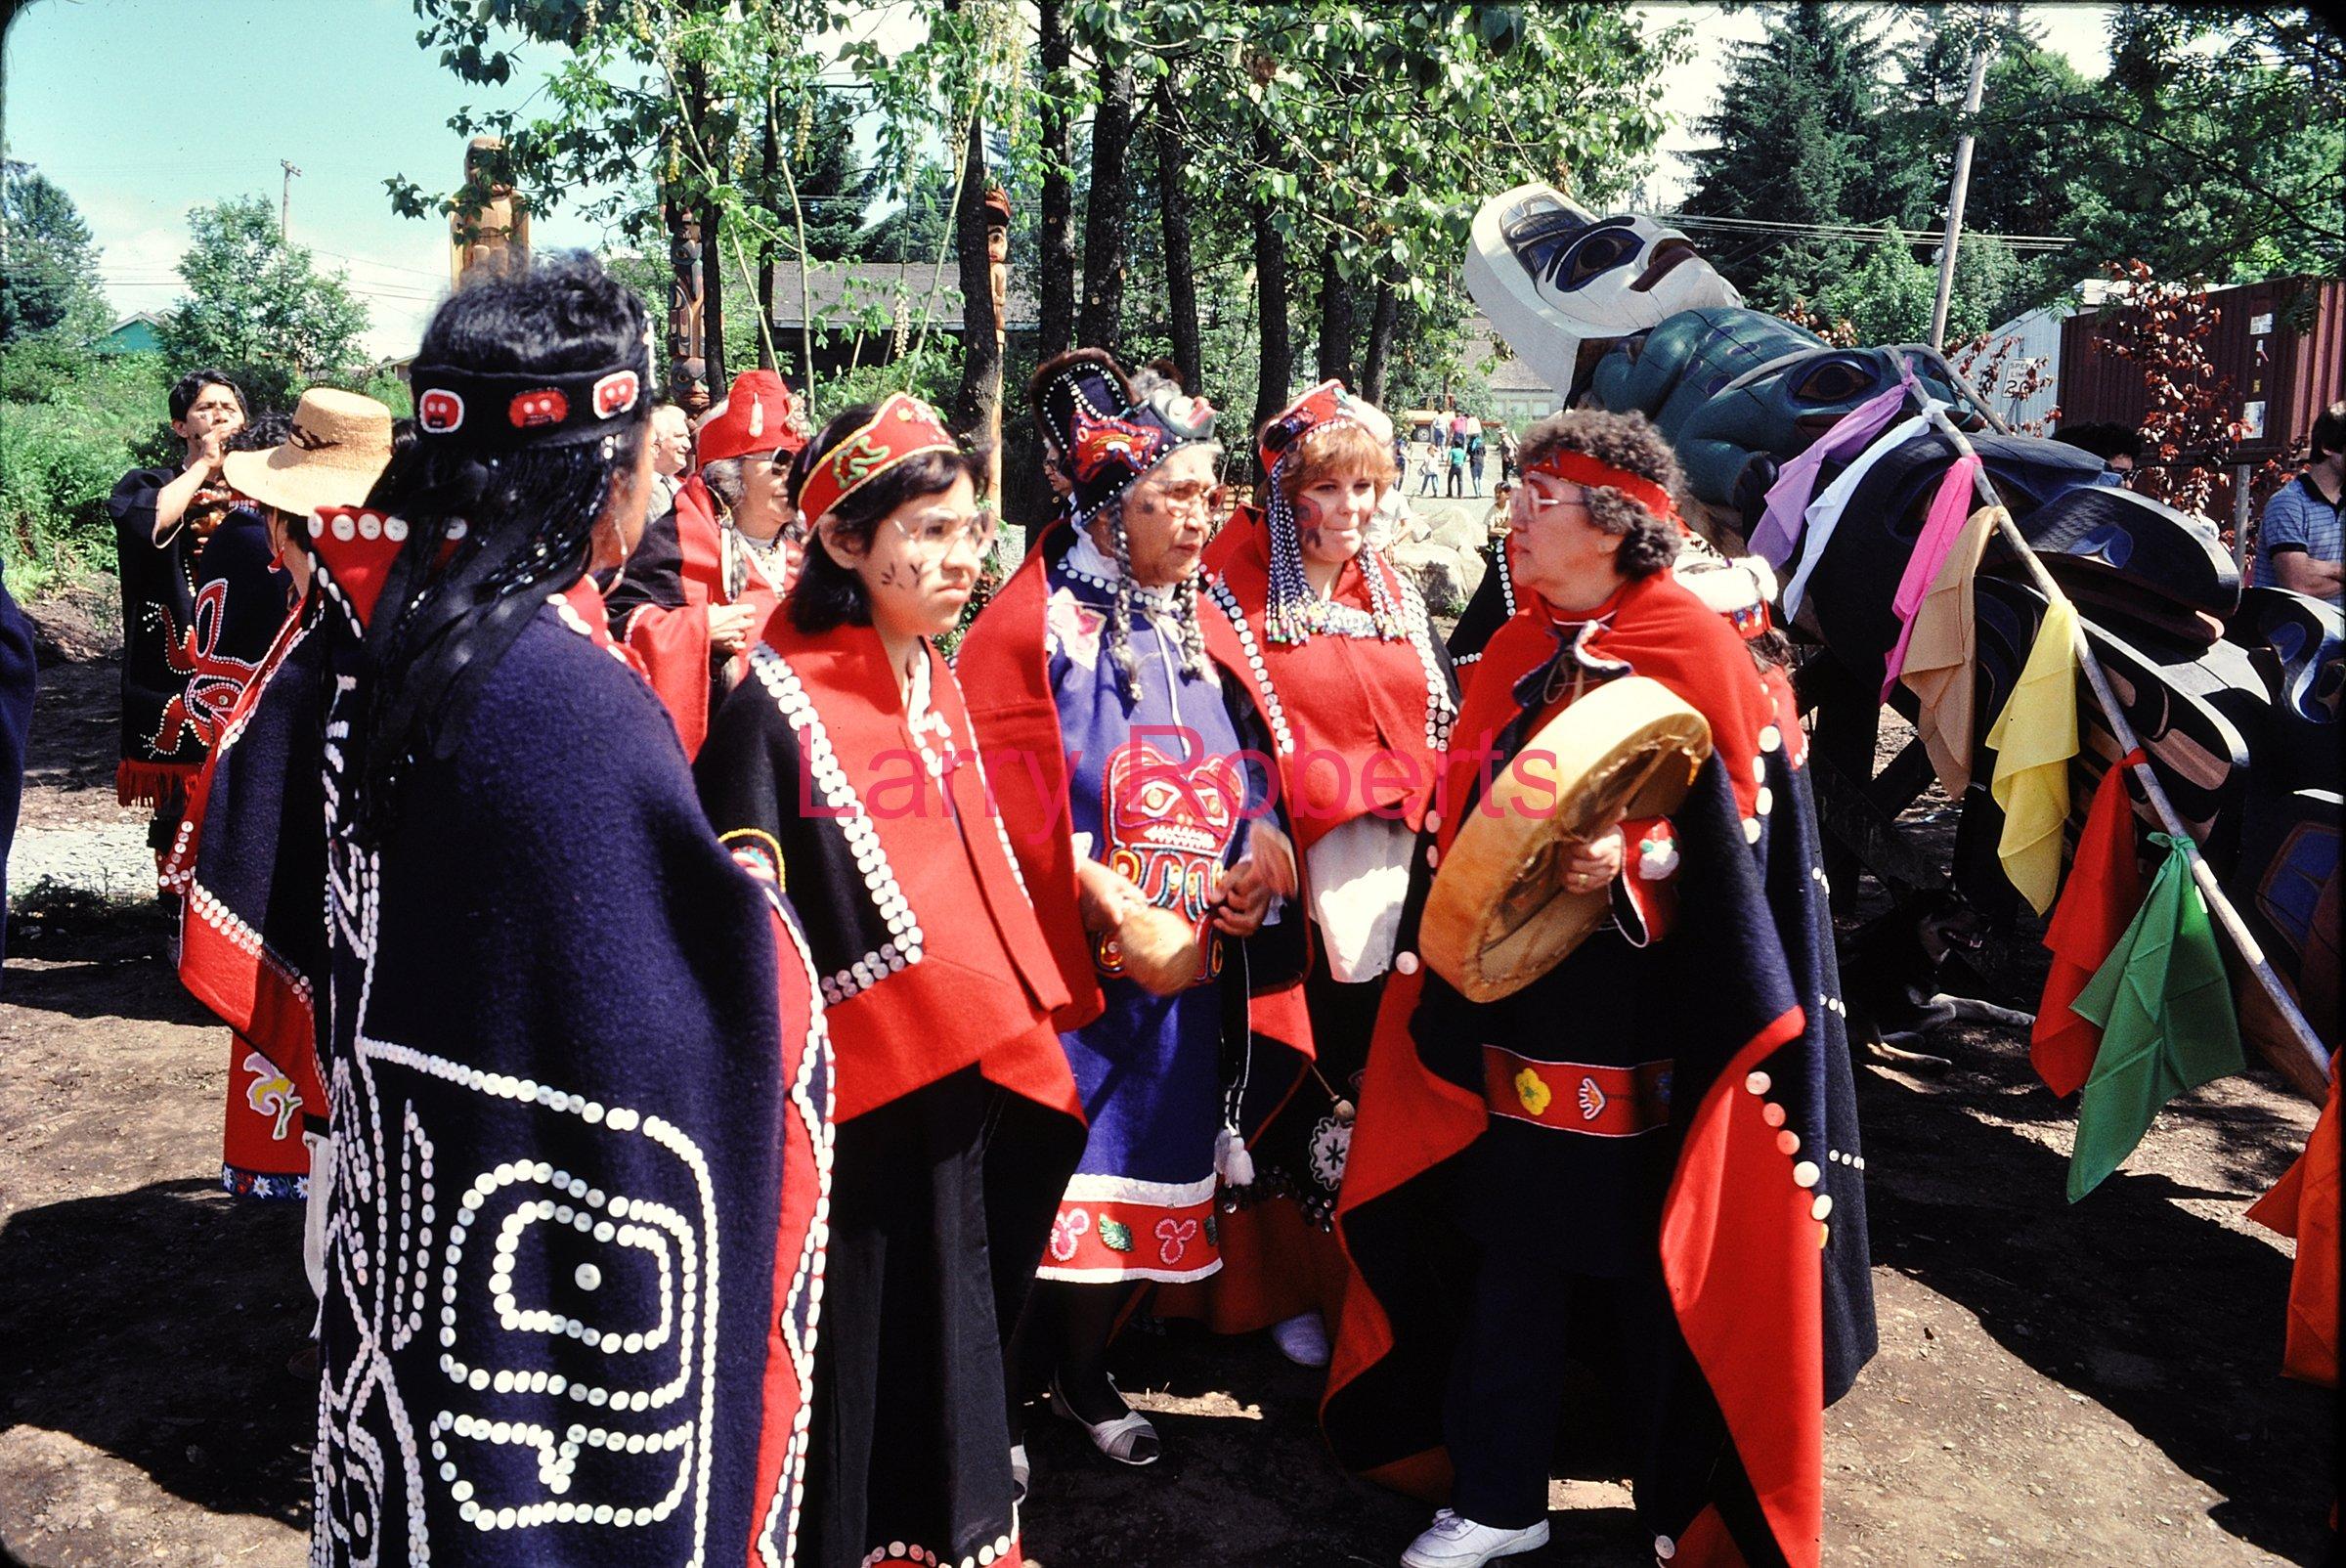 Tlingit Dancers, Totem Poles Dedication, Wrangell, Alaska. July 1987.